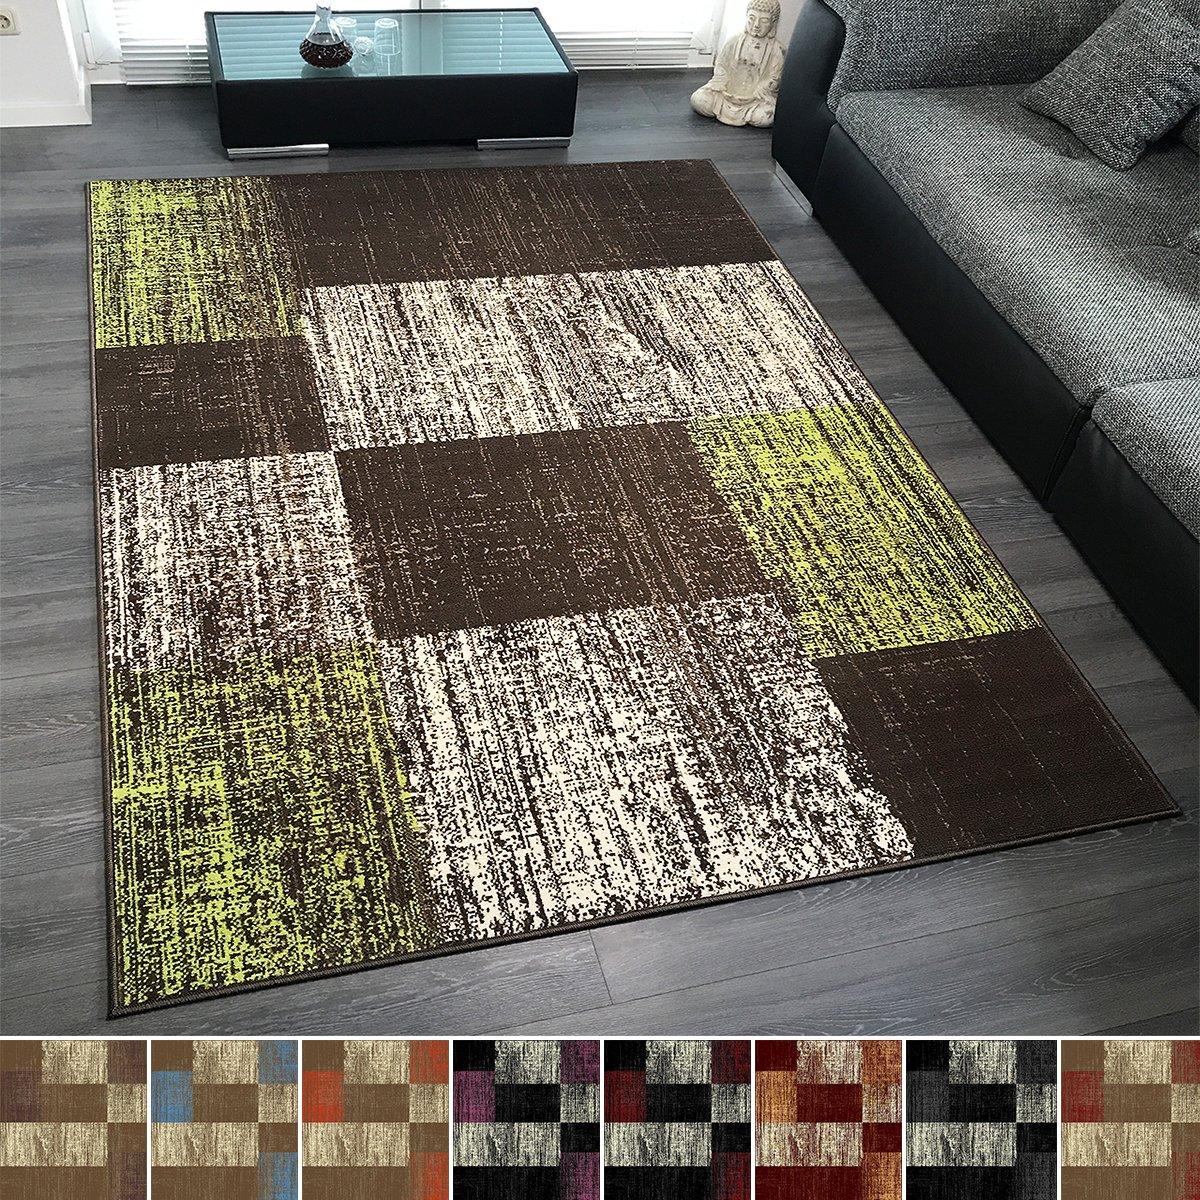 Design Velours Kurzflor Teppich 'Patch' Vintage Muster, Farbe Rot, Größe 200x290 cm